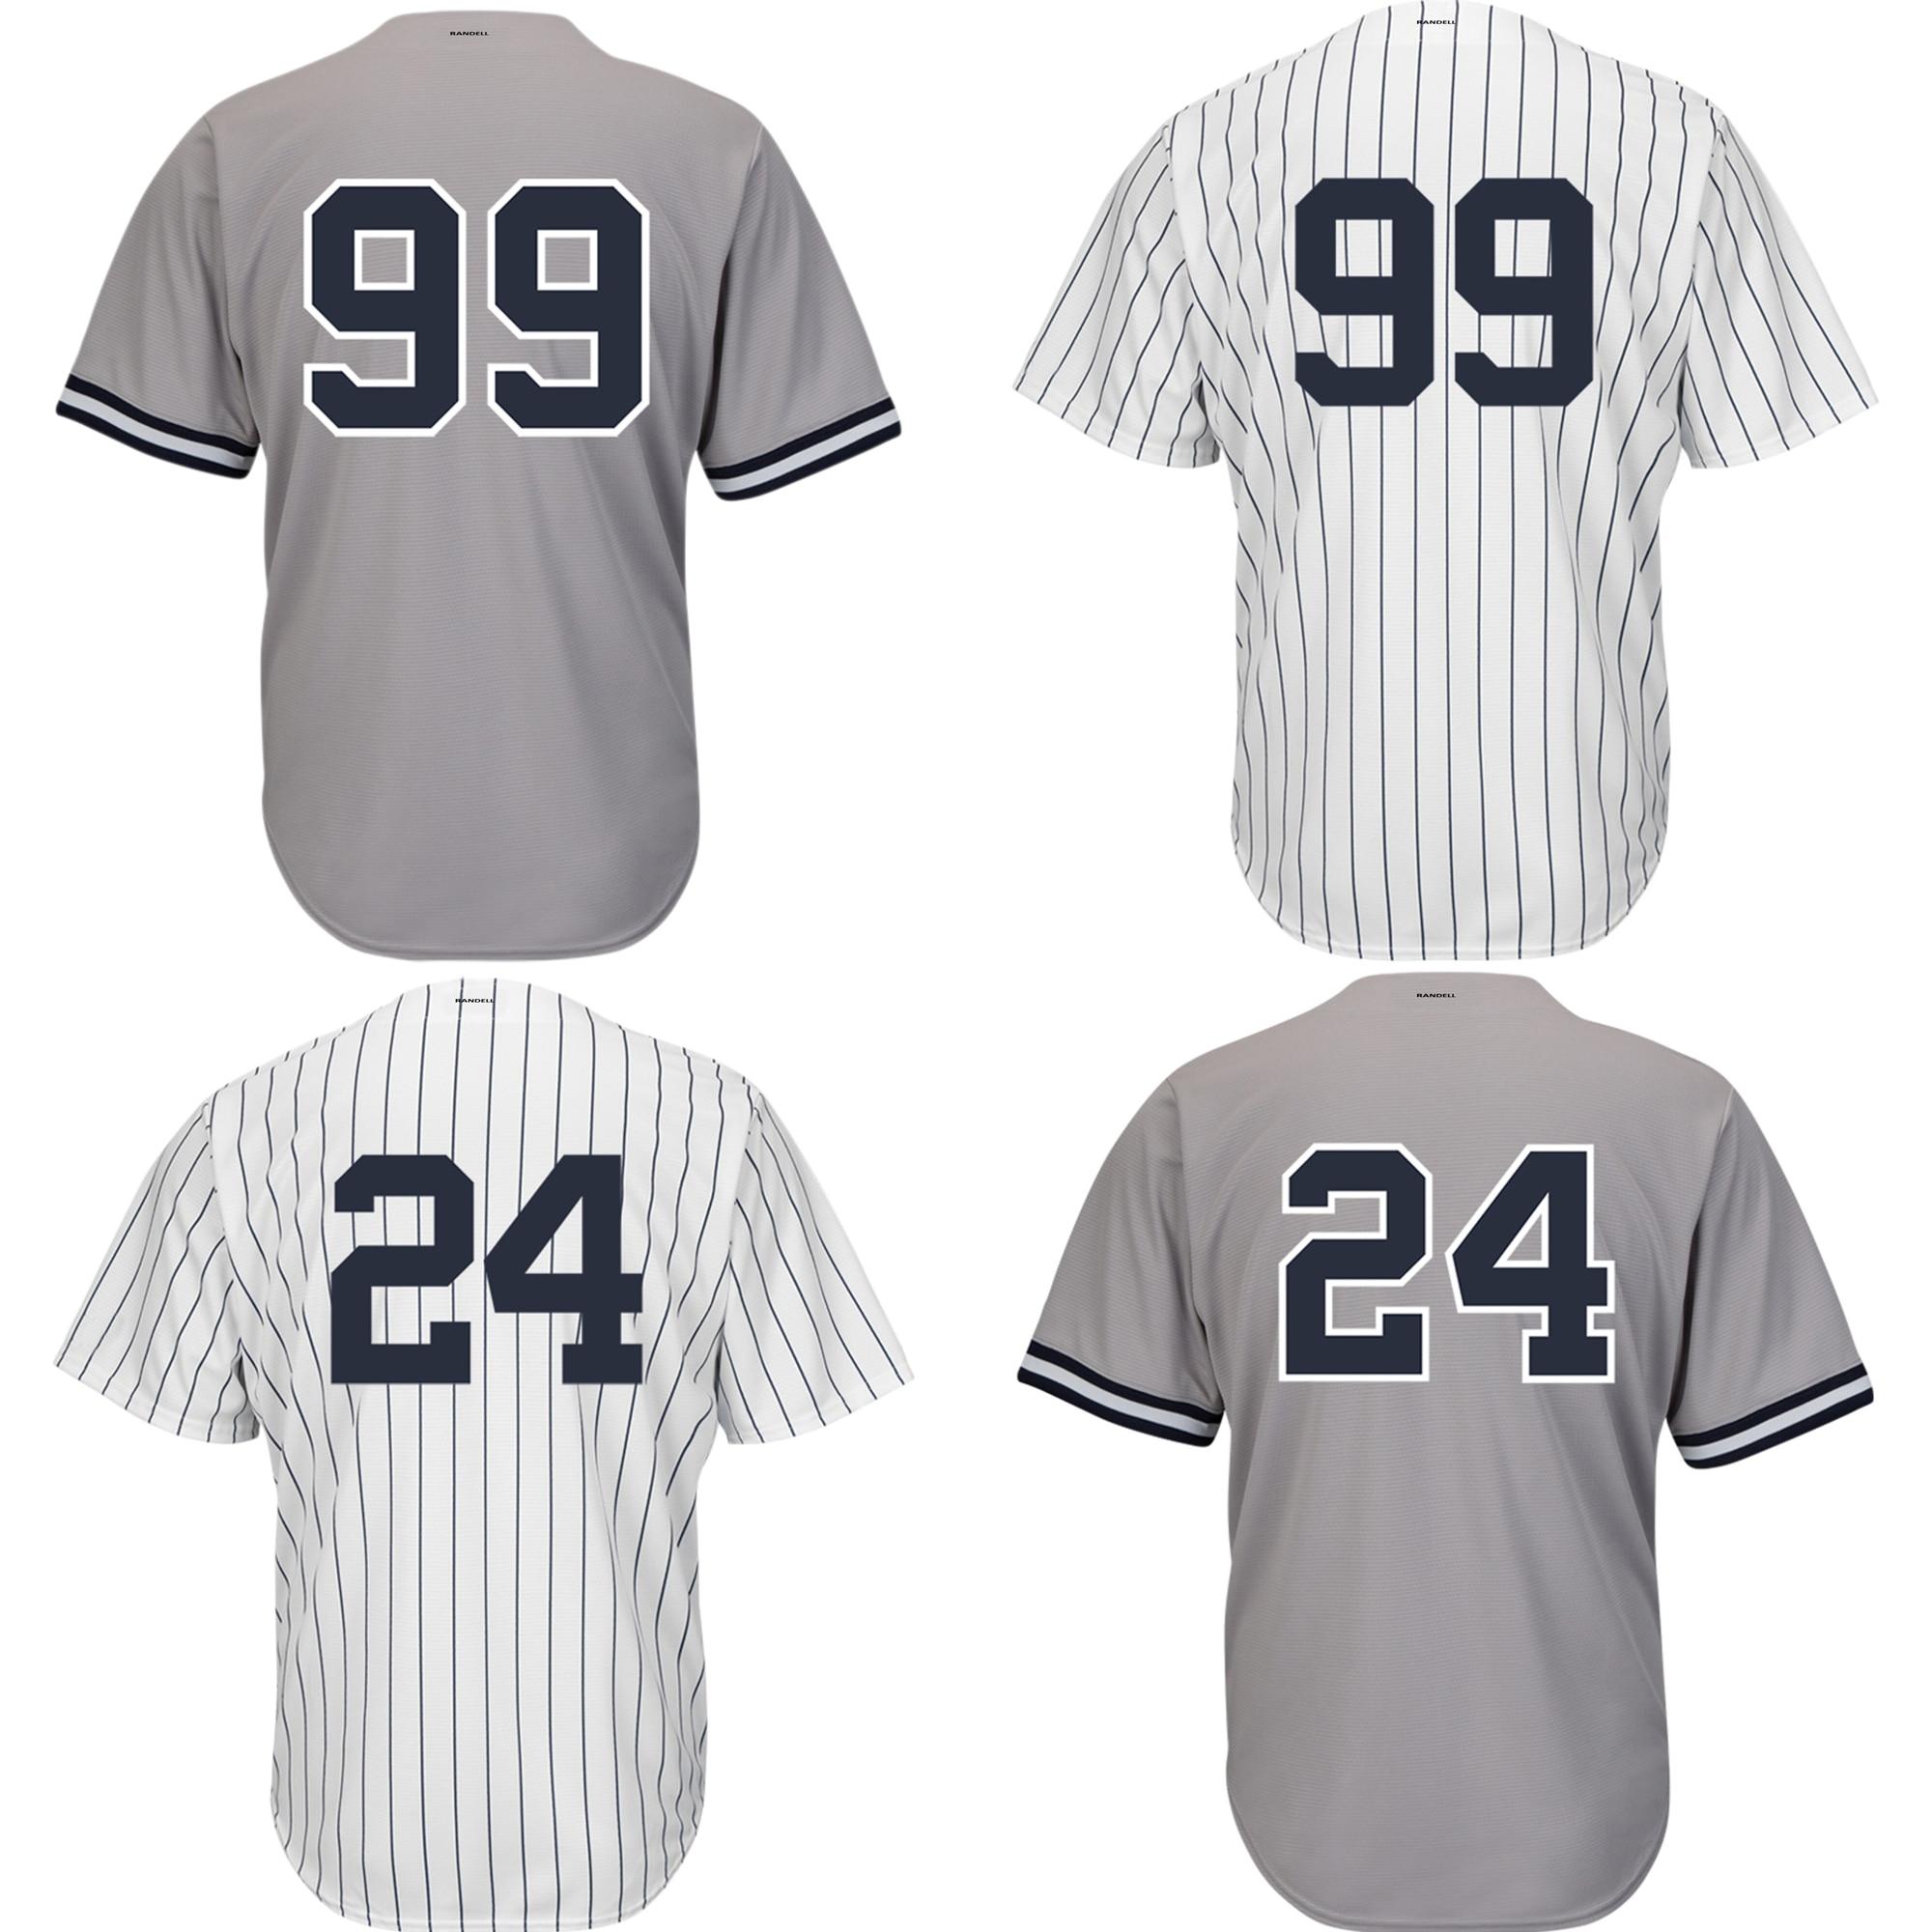 99 Judge 24 Sanchez Jersey Men's Baseball Jerseys New York White Grey